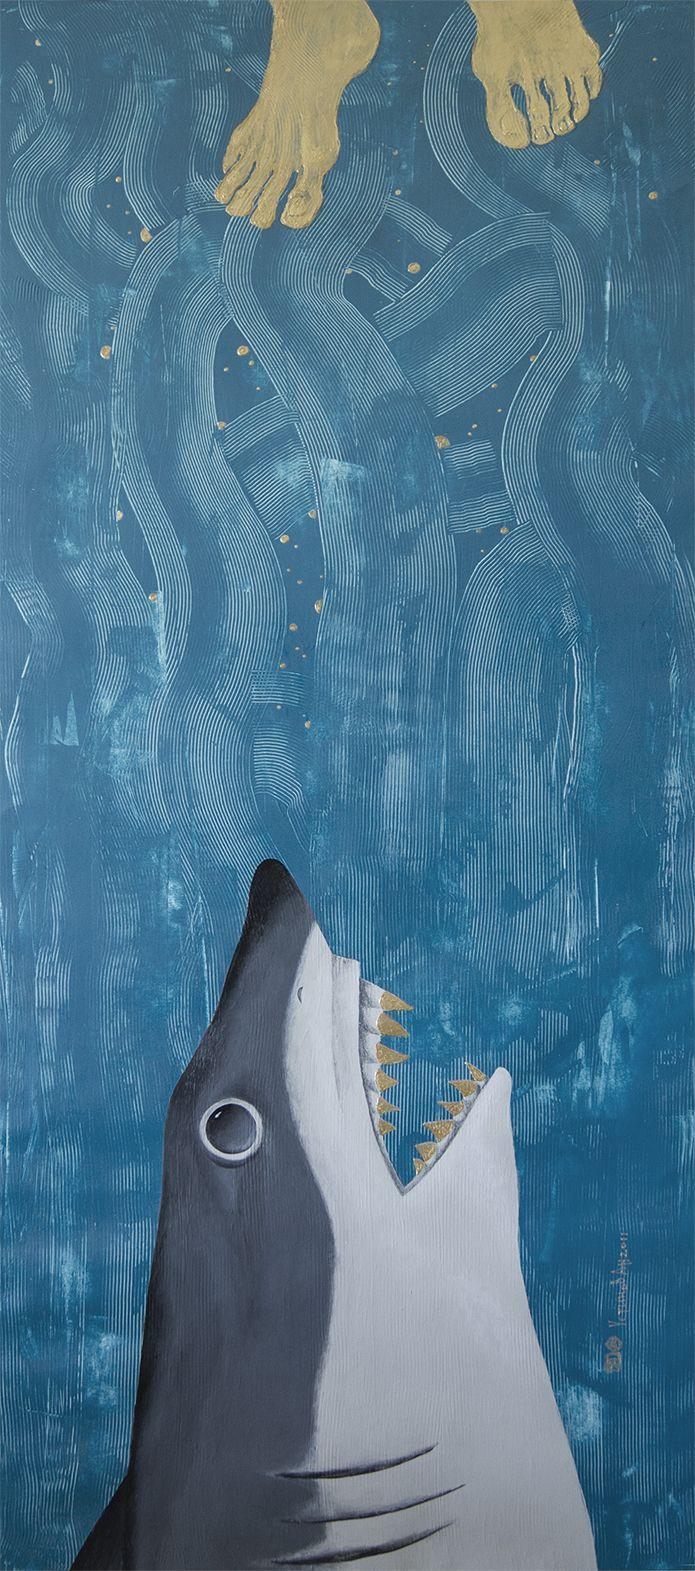 Shark Series -Food Chain- 140x60 cm paper,acryl